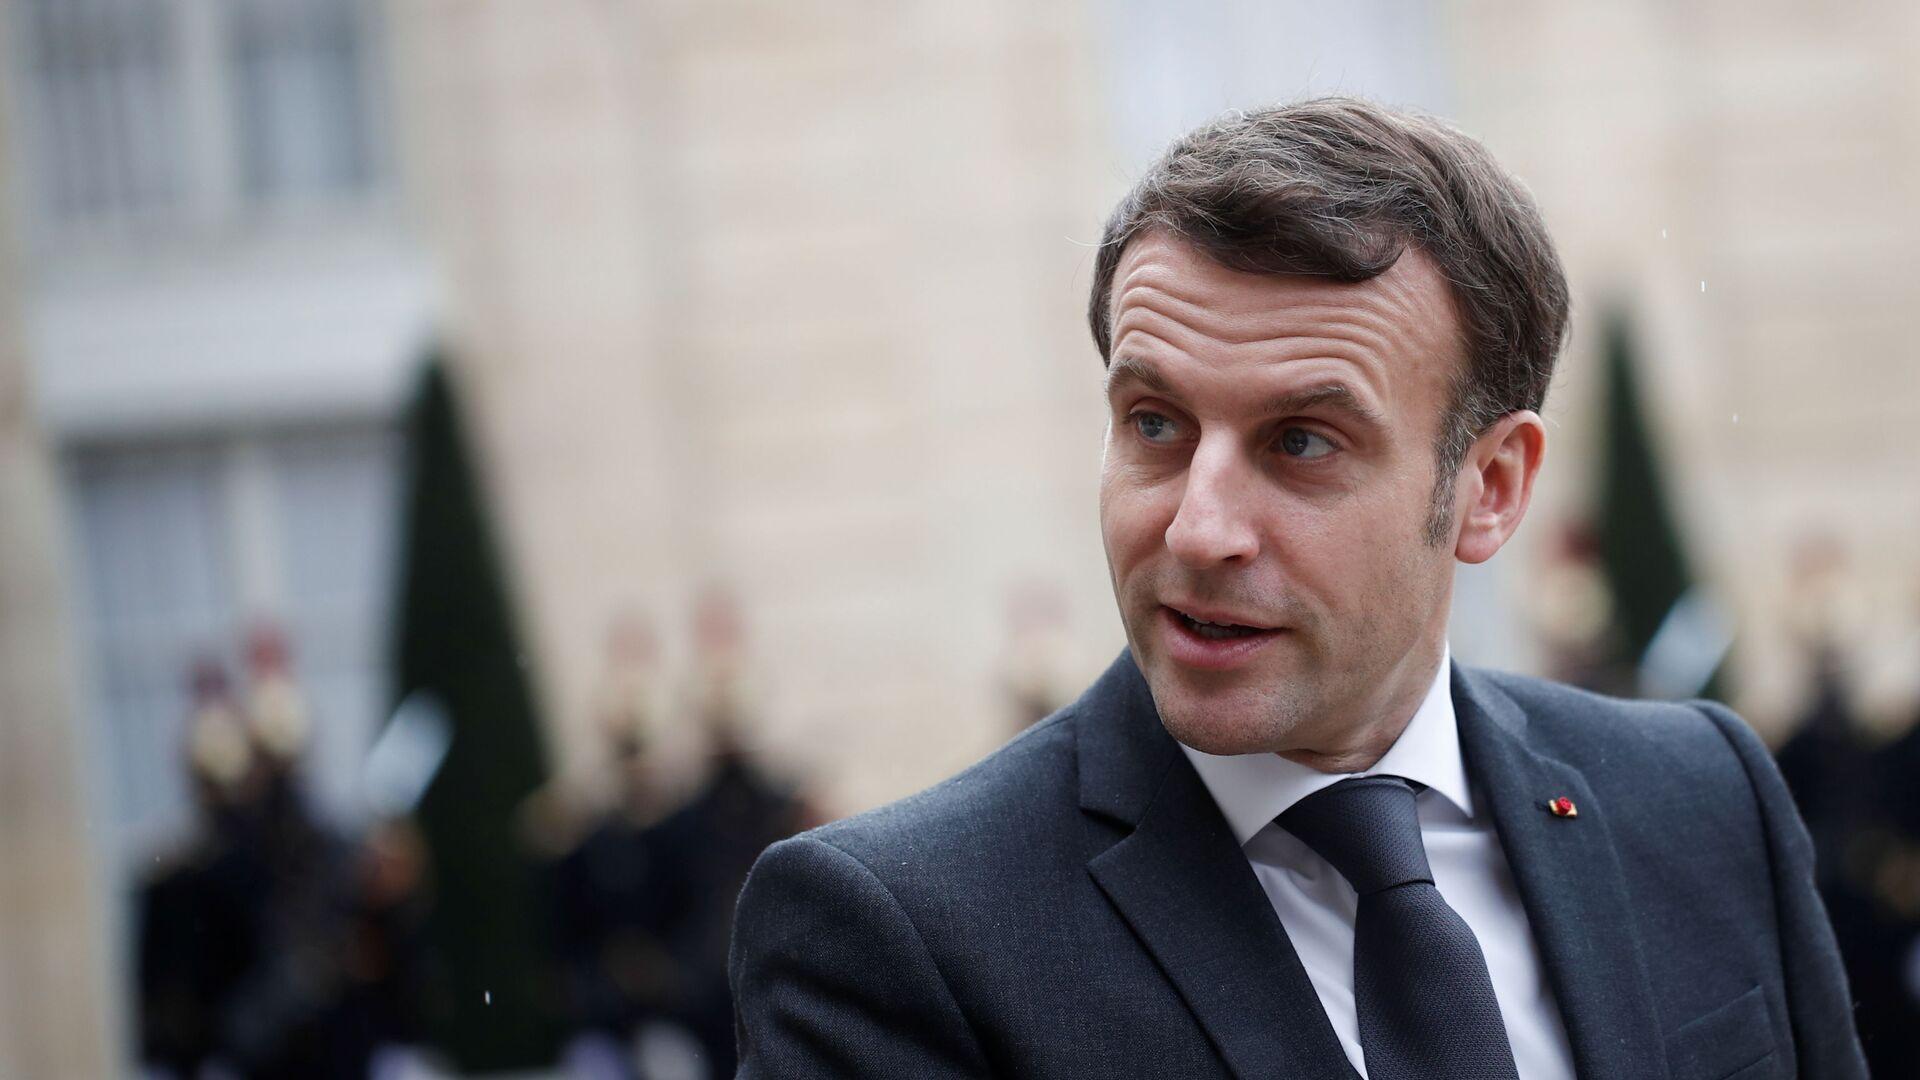 Emmanuel Macron, el presidente de Francia - Sputnik Mundo, 1920, 17.04.2021